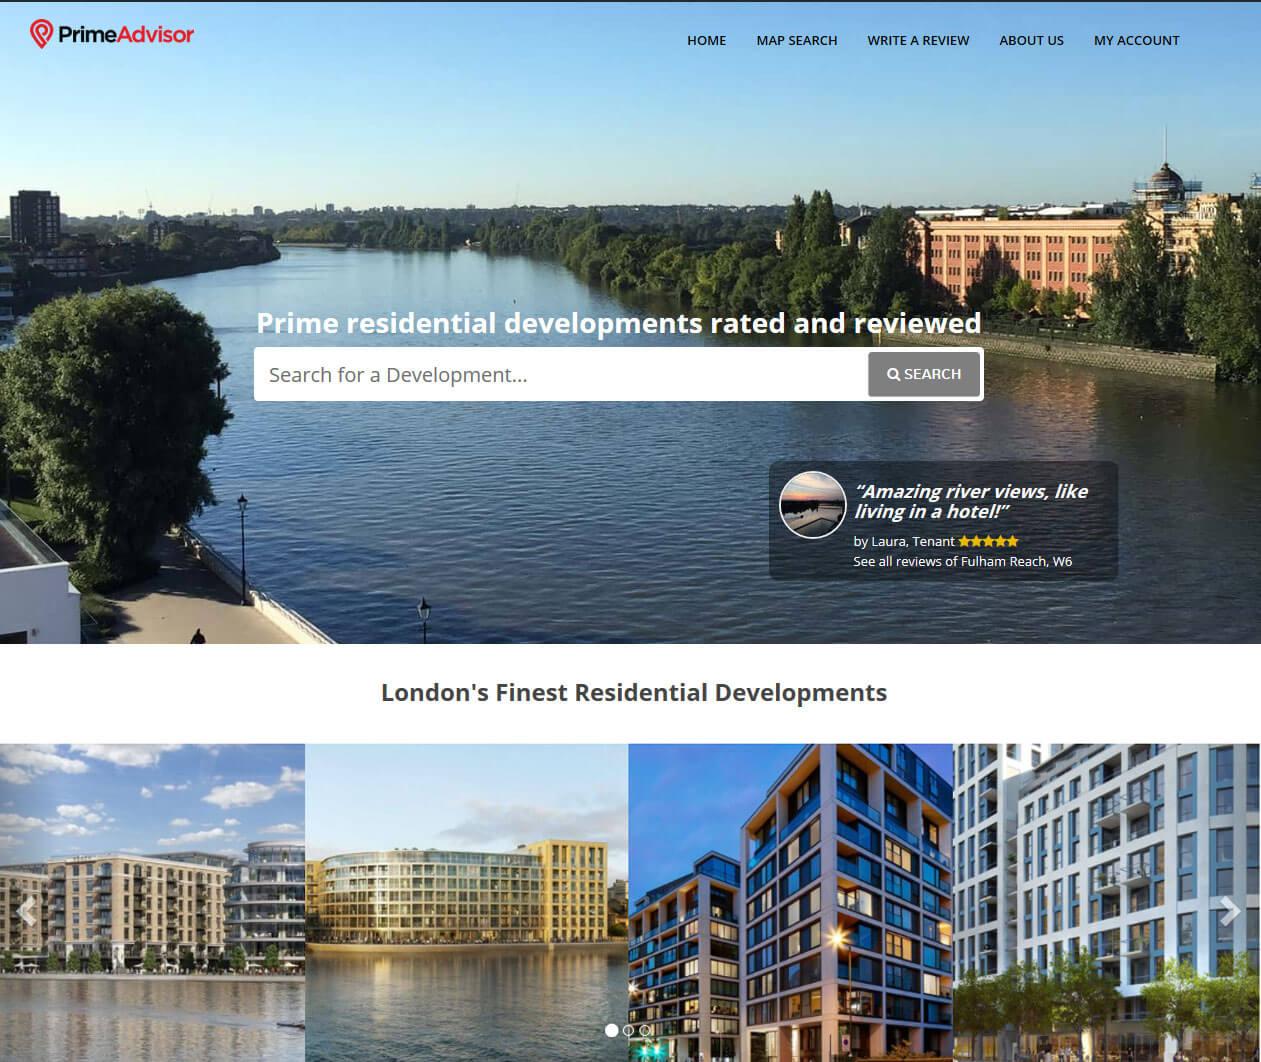 Website Maintenance of A PHP Powered Website - PrimeAdvisor